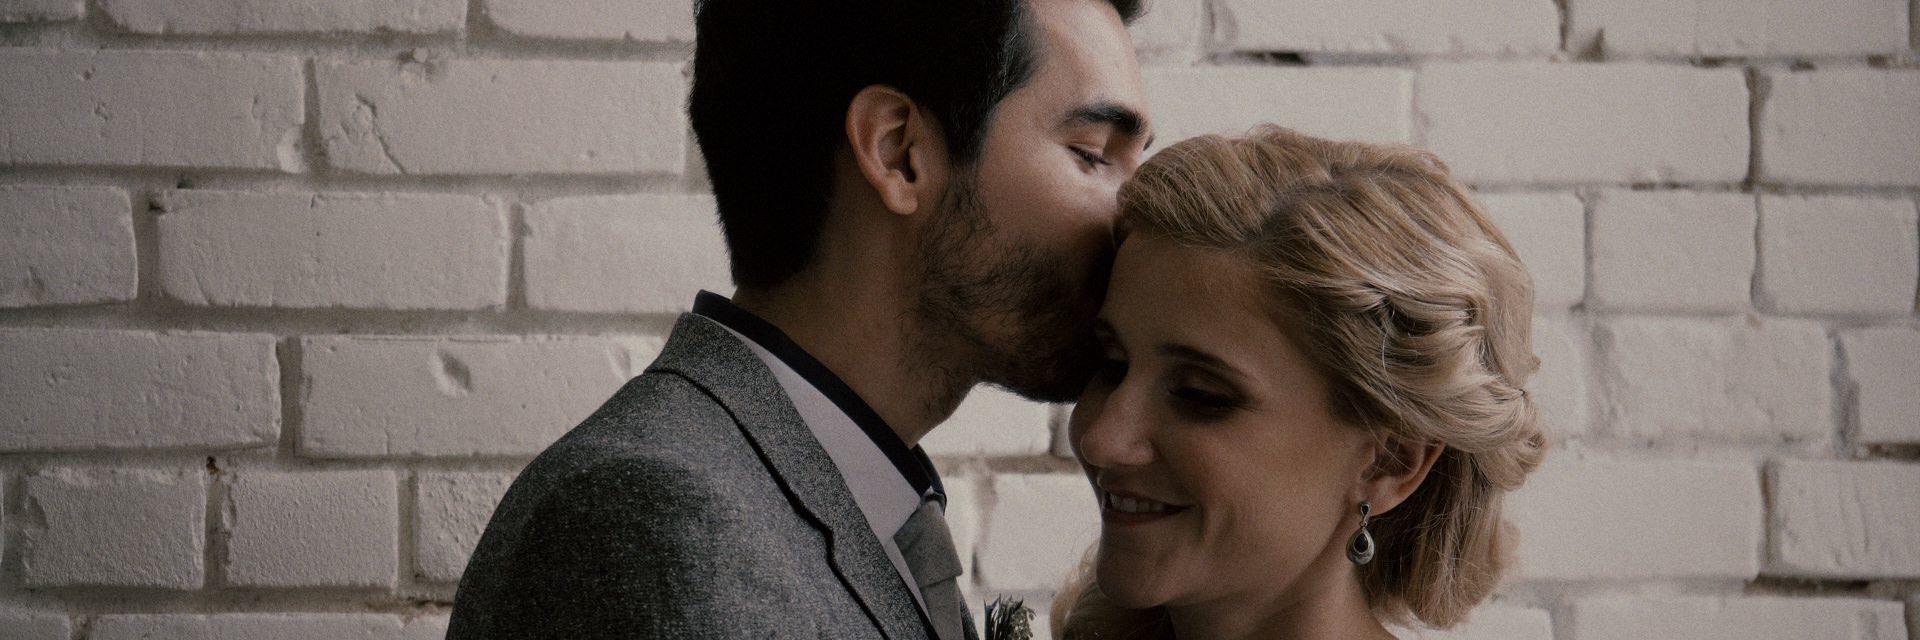 Tangier-wedding-videographer-cinemate-films-03